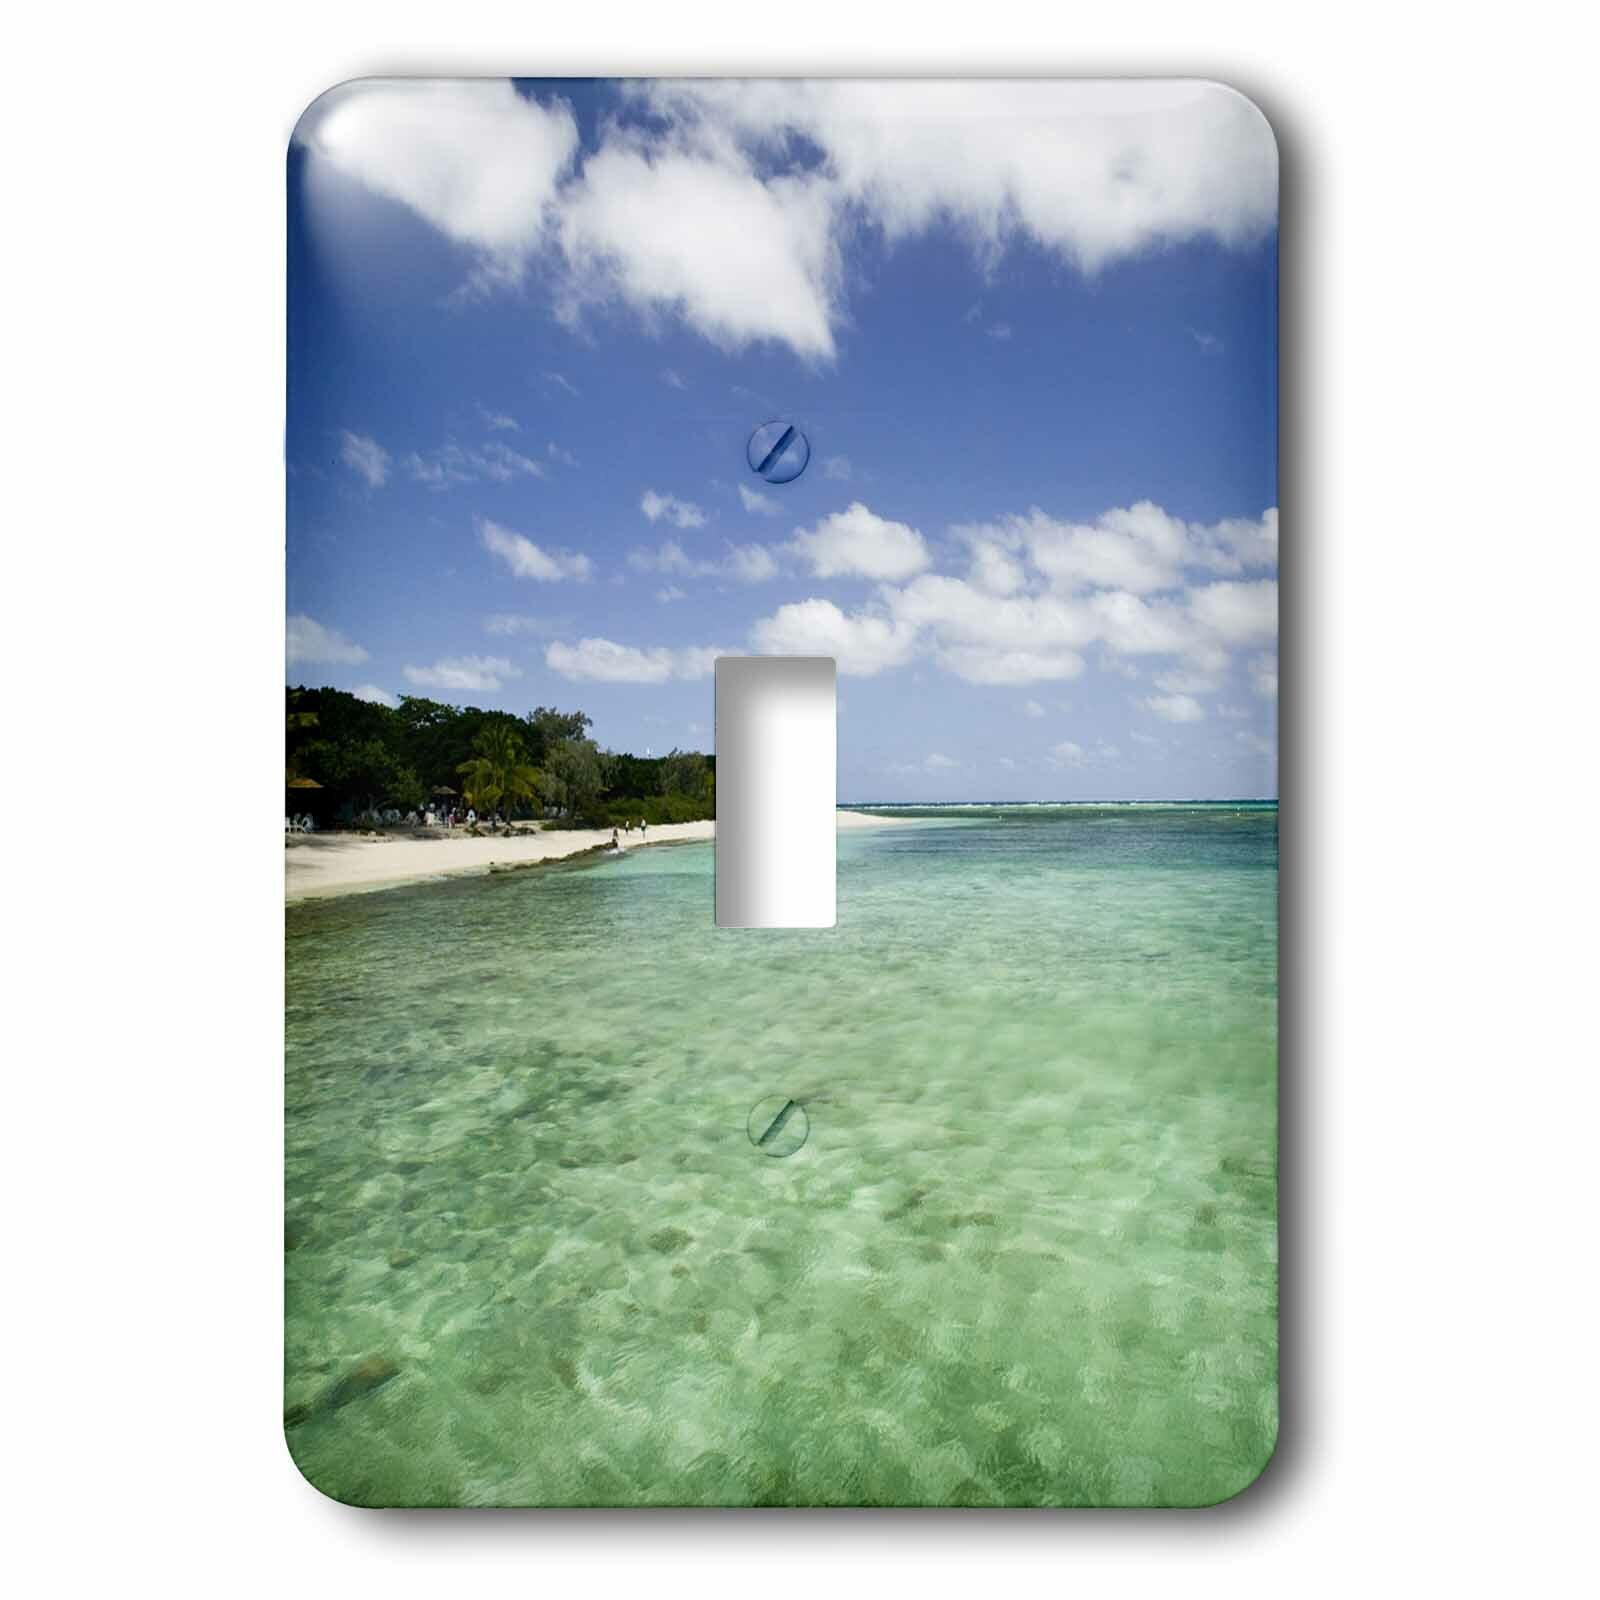 3drose New Caledonia Amedee Islet Tropical Beach 1 Gang Toggle Light Switch Wall Plate Wayfair